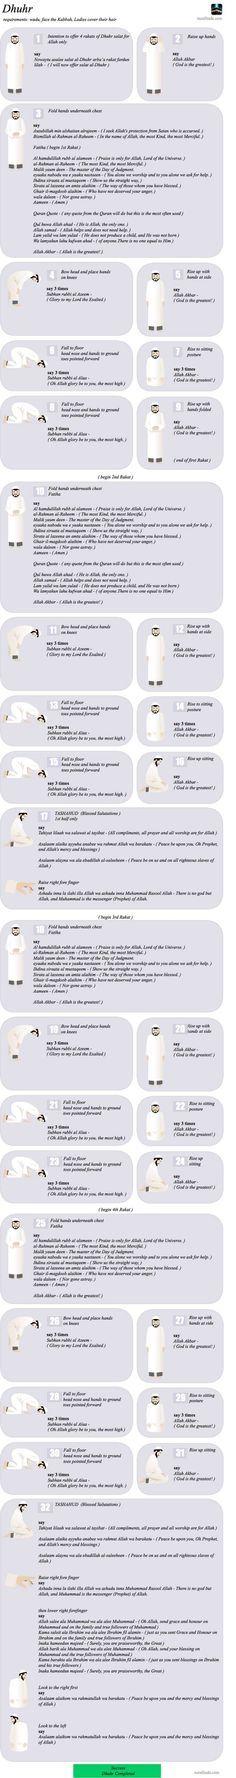 Zohar Namaz Salah info in Detail. http://www.islamic-web.com/namaz-salat/how-to-offer-salat/